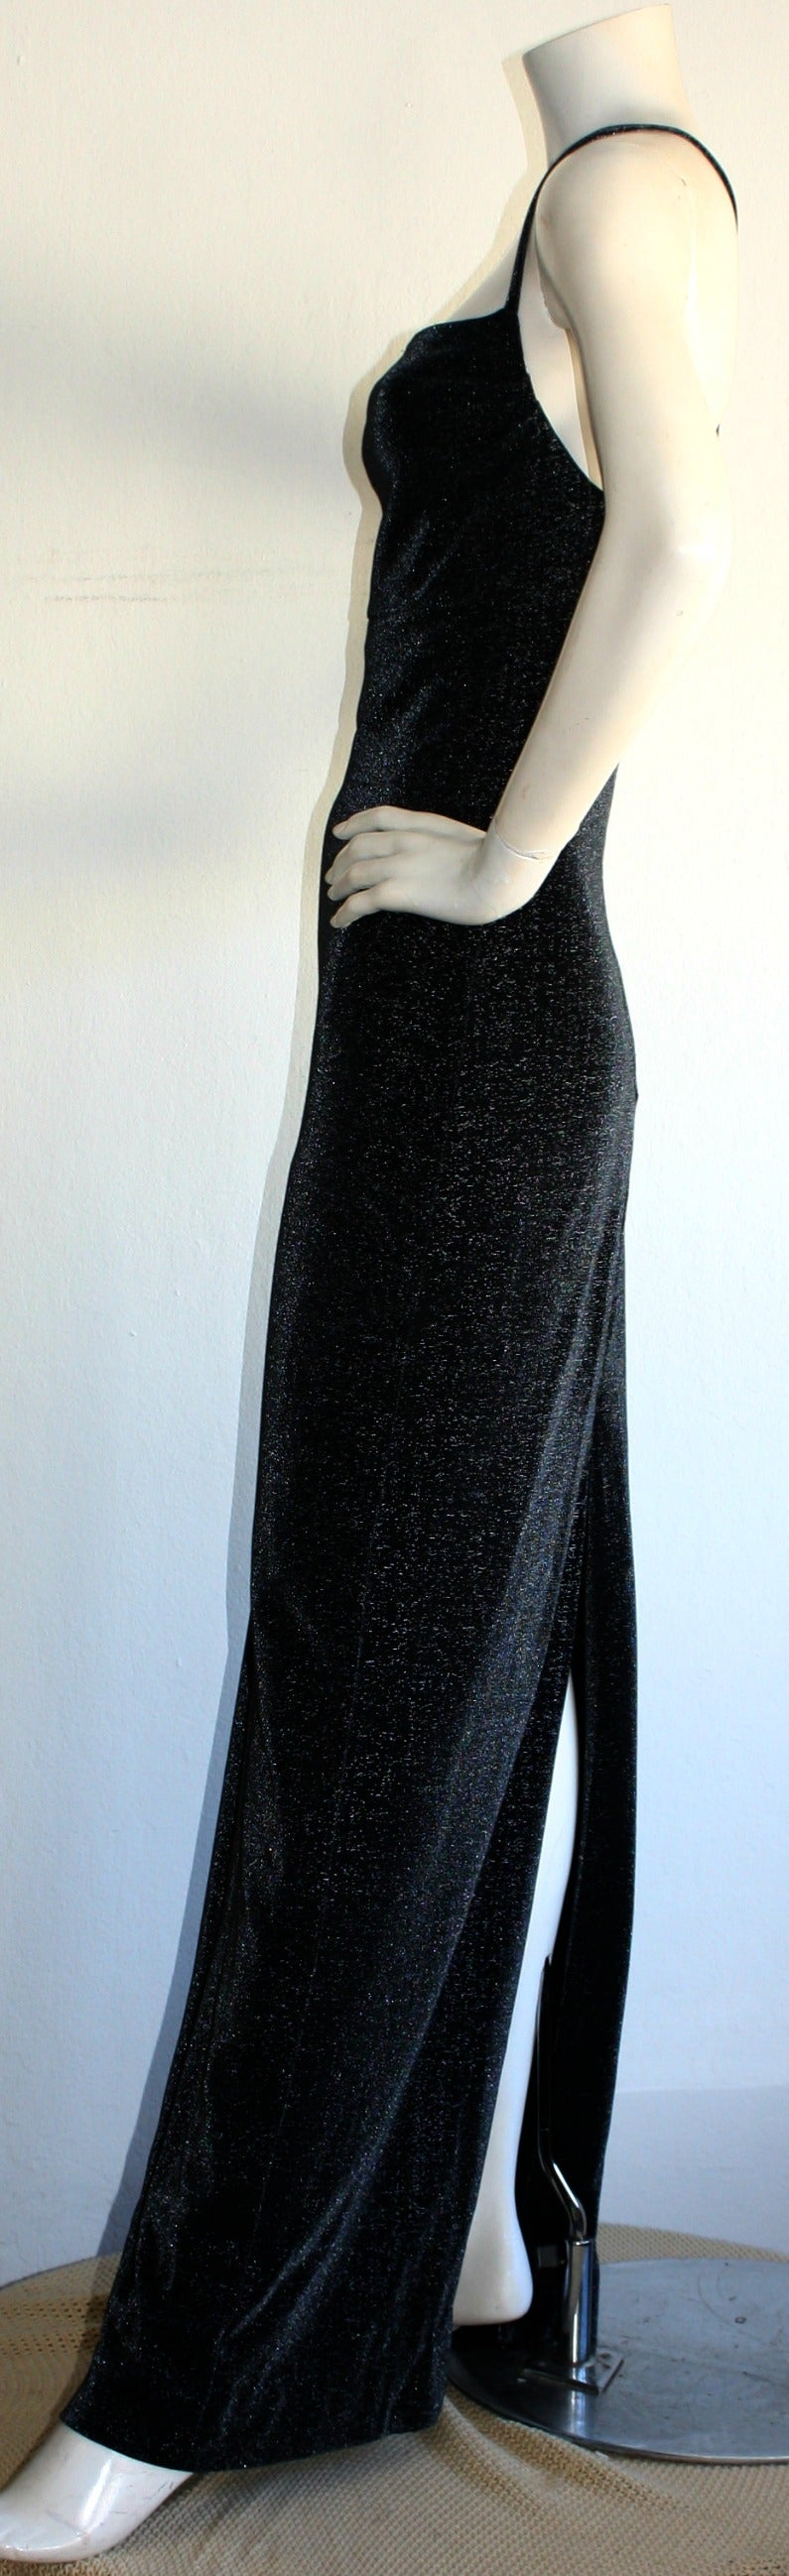 1990s Vintage Gianni Versace Pre-Death Versus Silver Metallic Criss Cross Gown 7